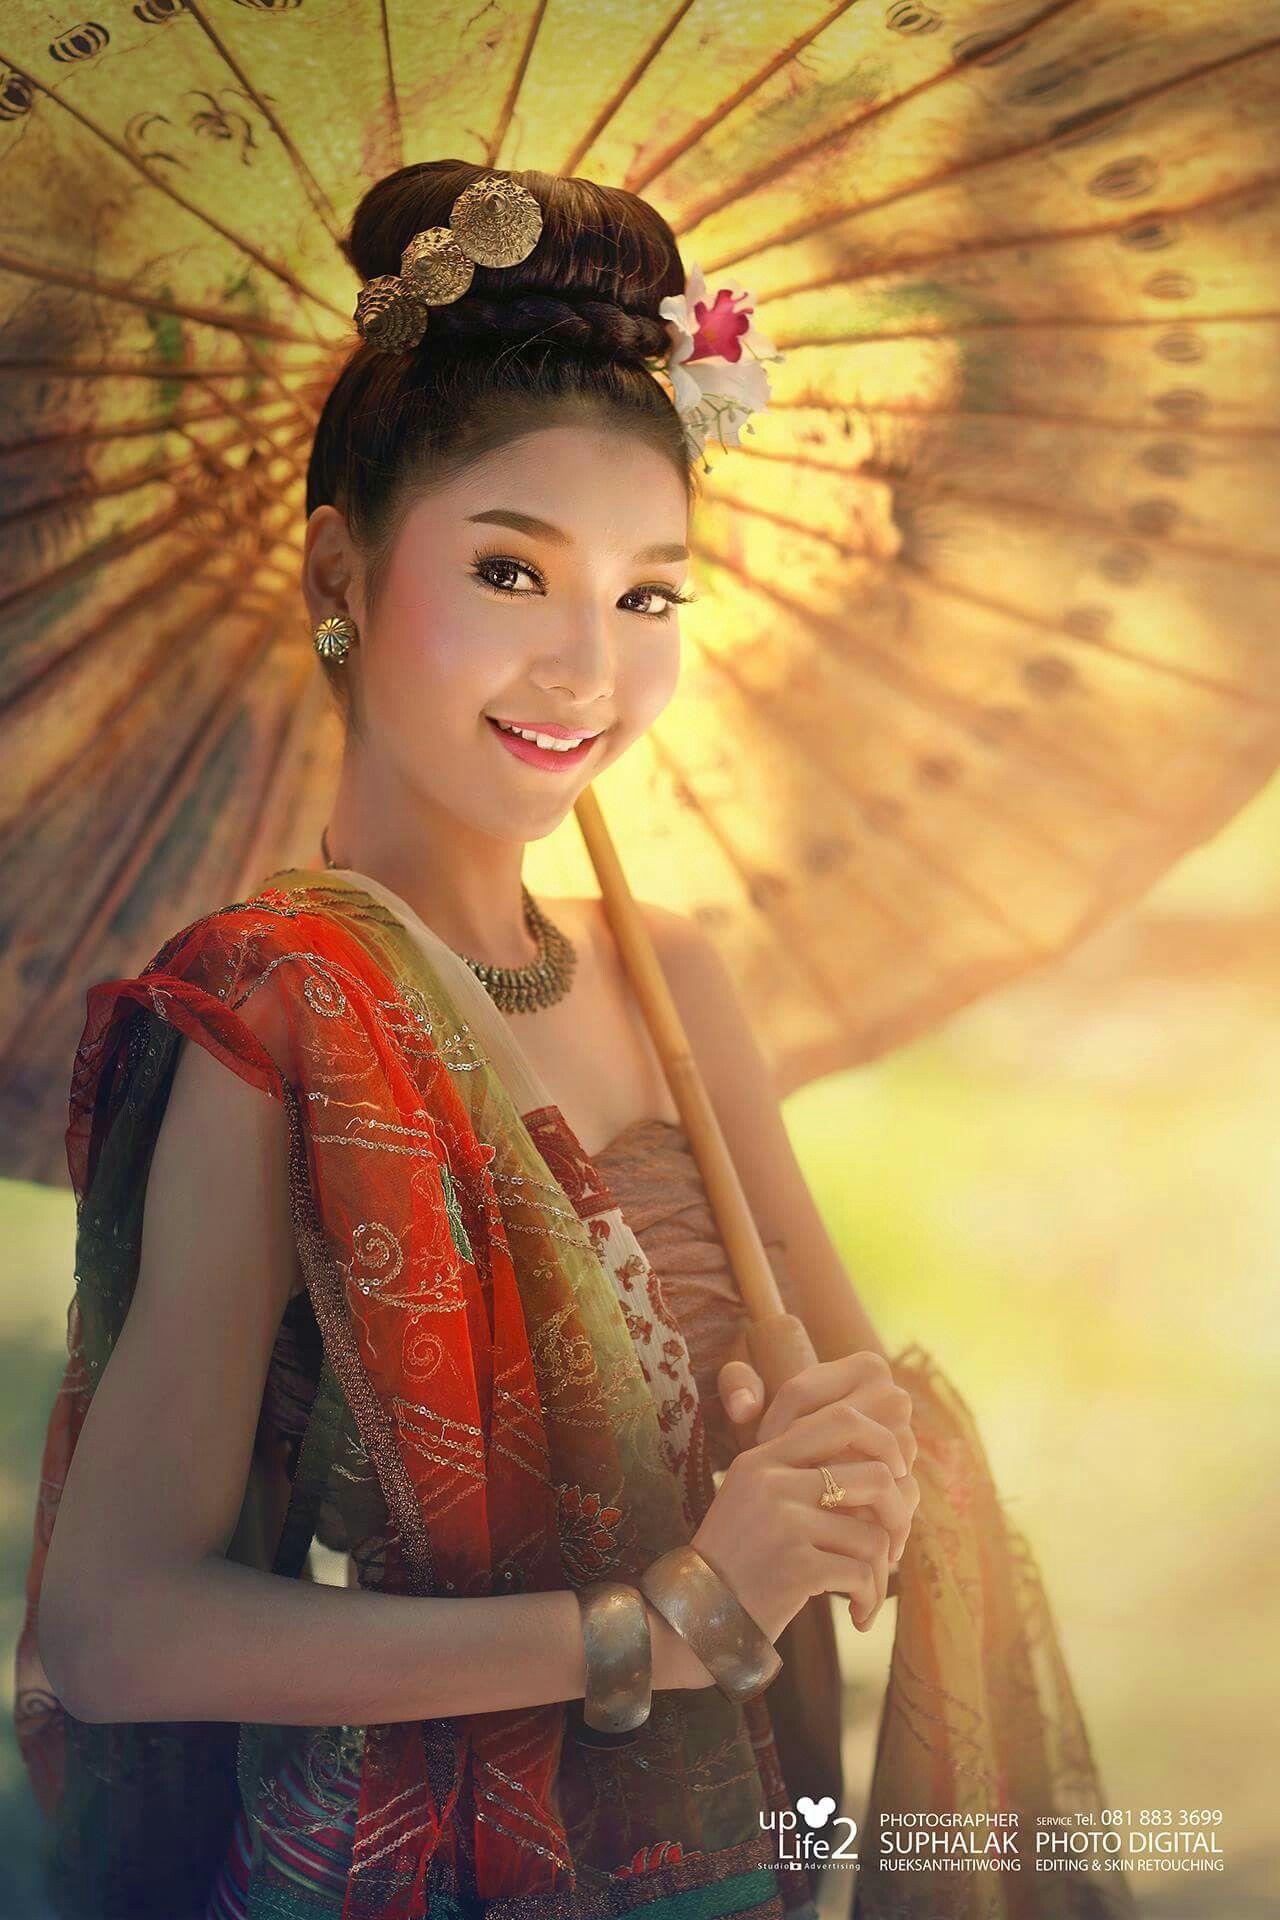 "upLife2 Workshop Ayutthaya ""แม่ภญิงล้านนามาเยือนอยุธยา"" Organize ทุร"